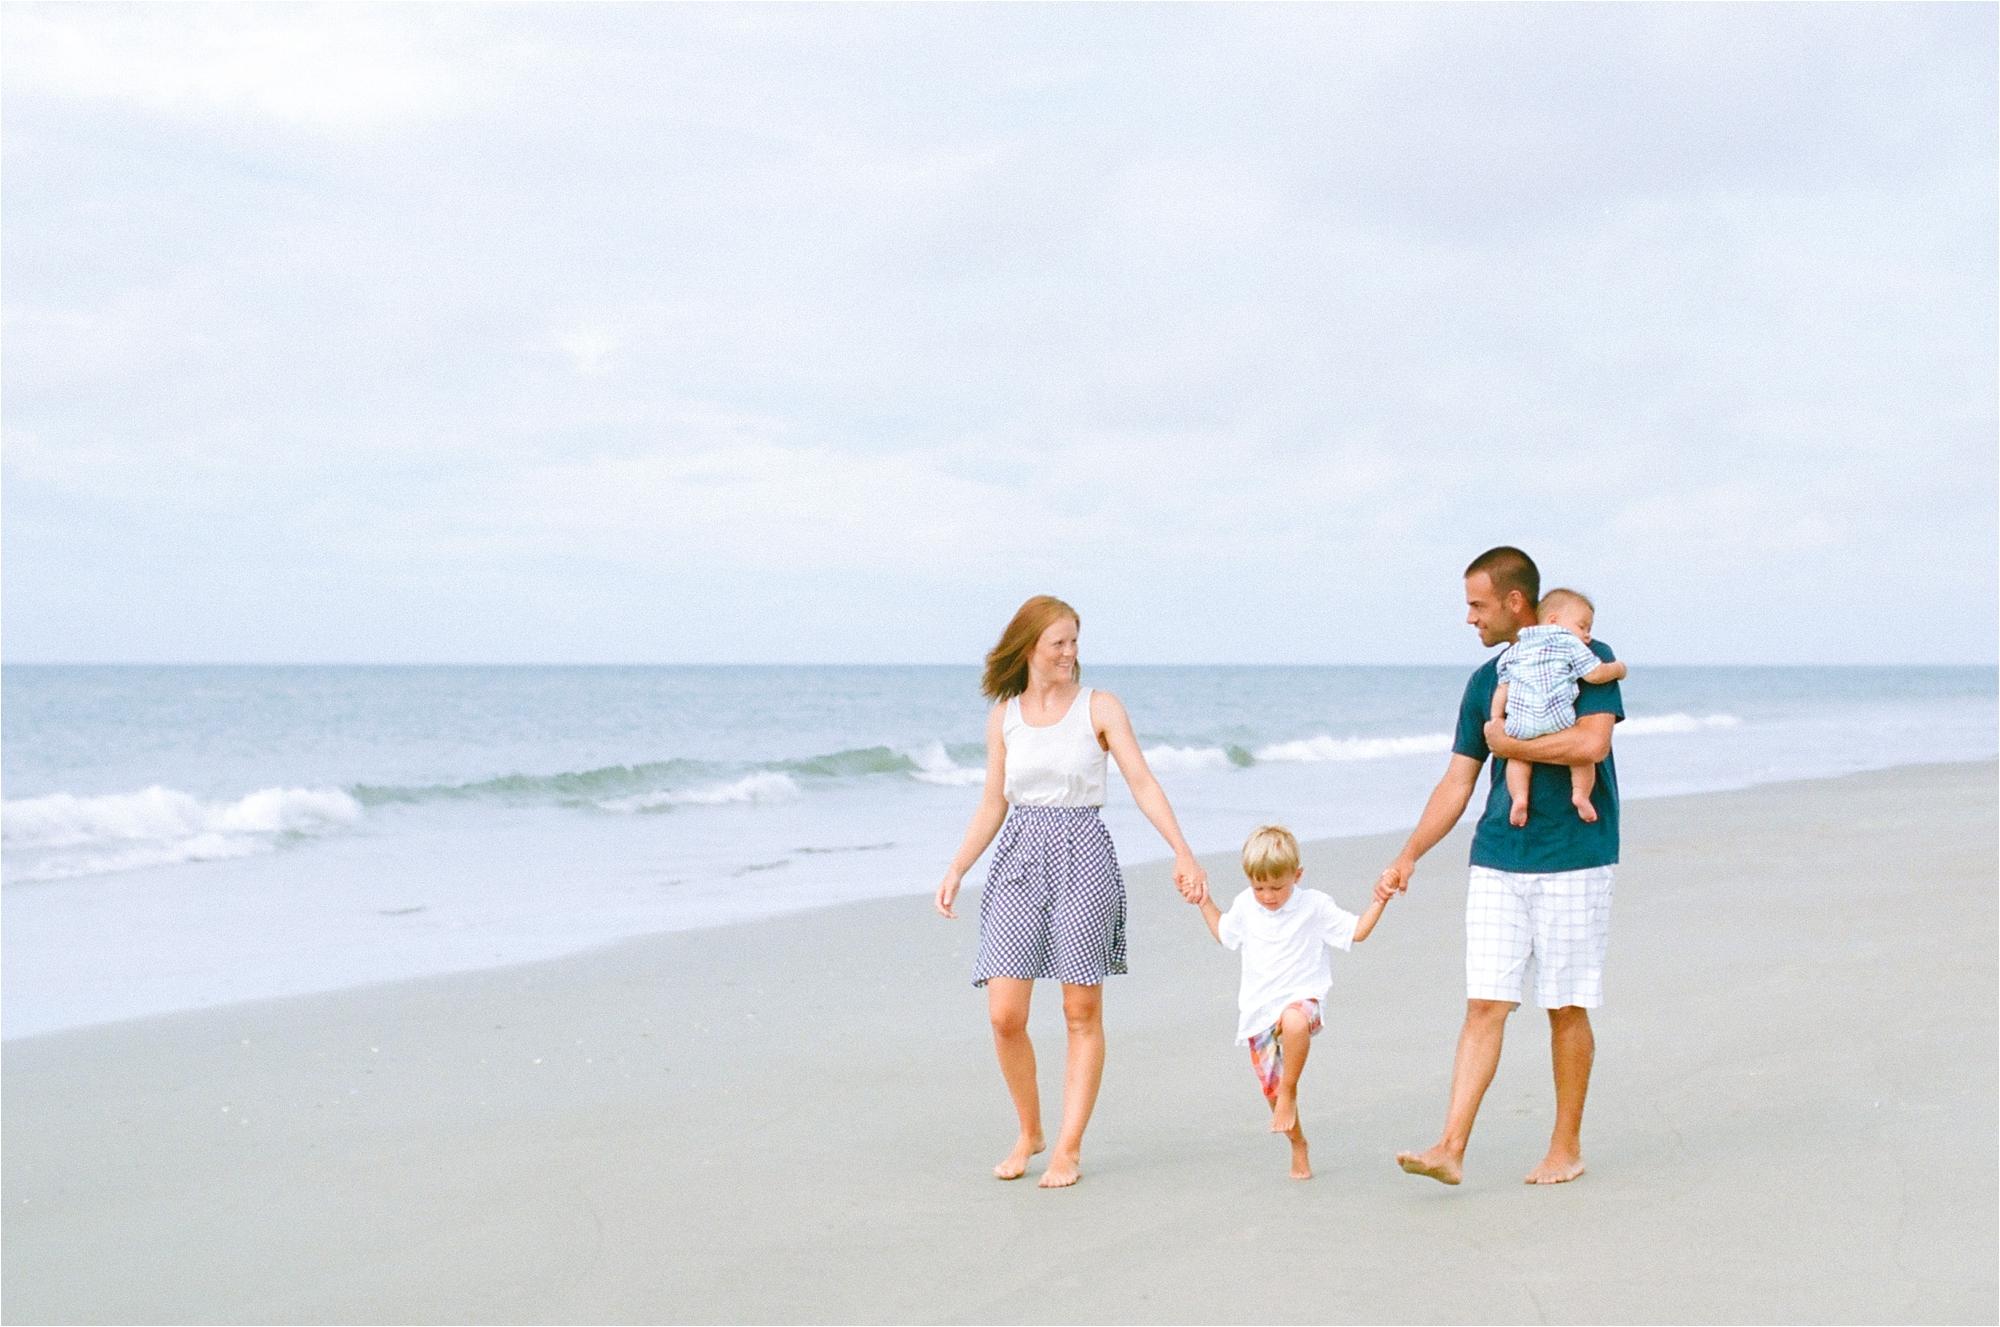 yonce-beach-family-lifestyle_0013.JPG